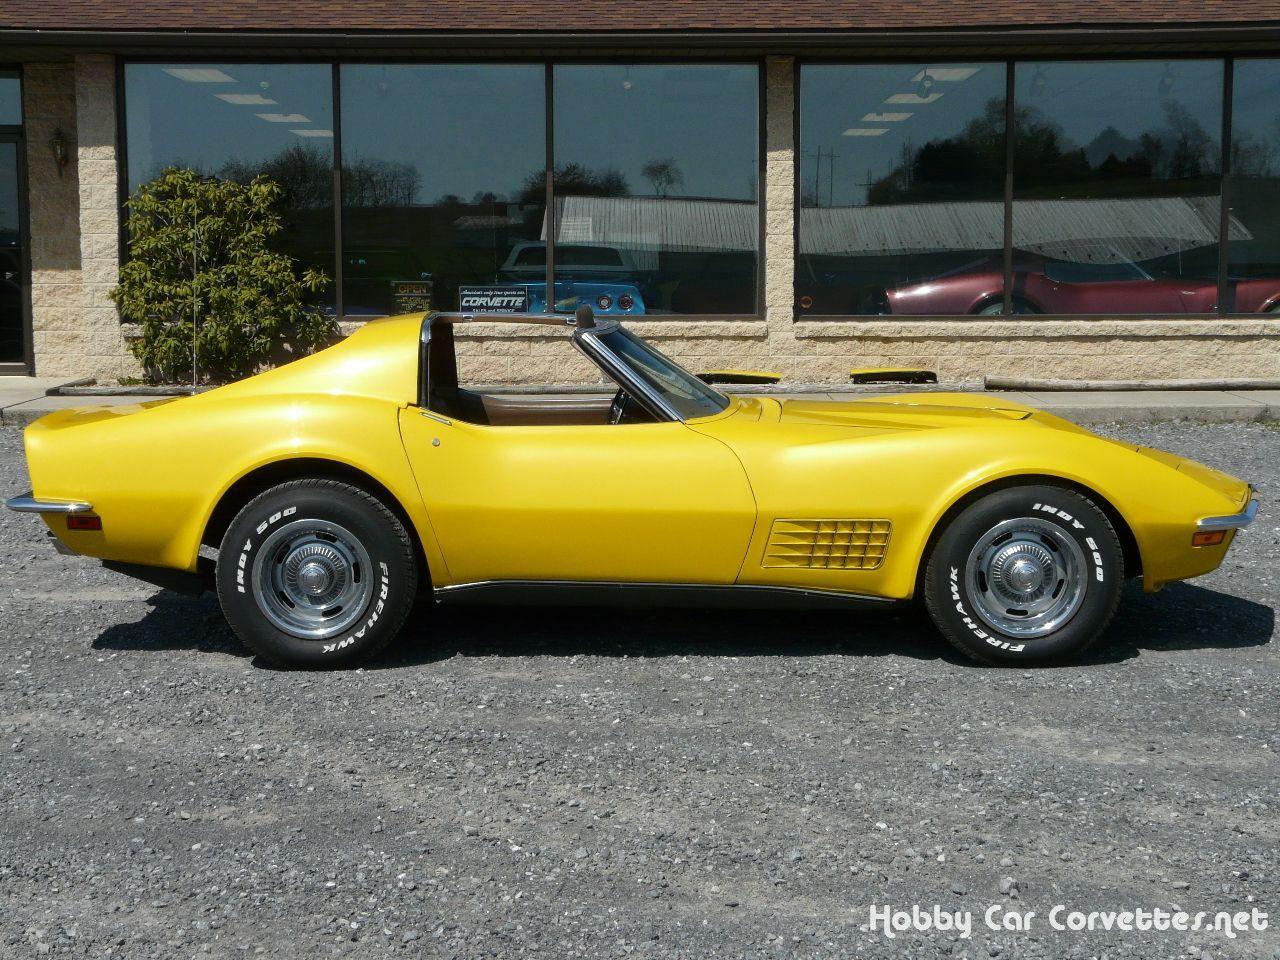 Best 25 yellow corvette ideas on pinterest chevrolet corvette stingray chevrolet corvette 2015 and stingray chevy